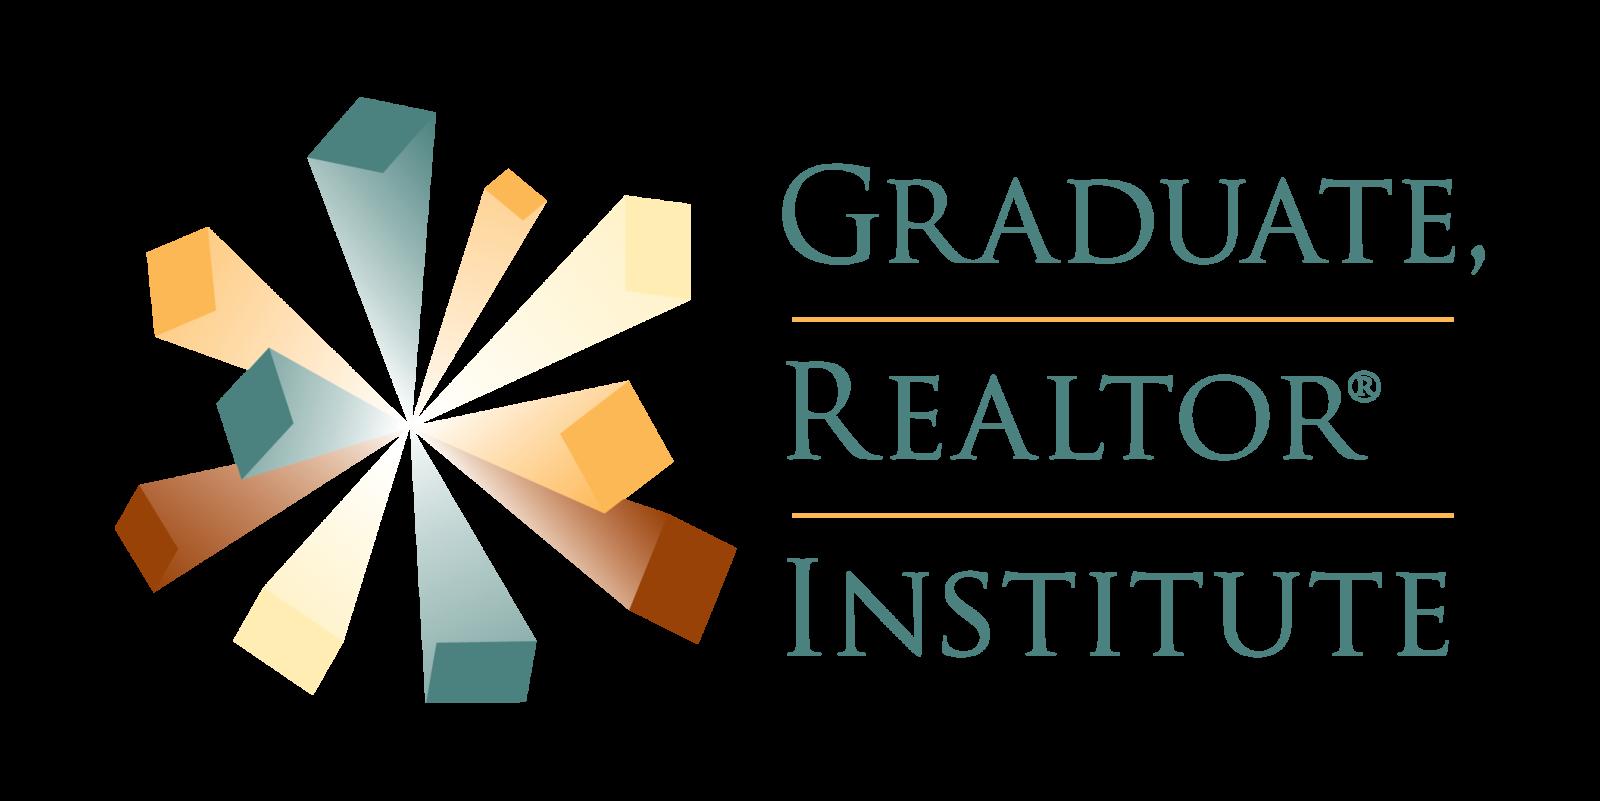 Kat Mcclary Broker Gri Pmn Riverview Fl Real Estate Graduate Realtor Institute Rgb